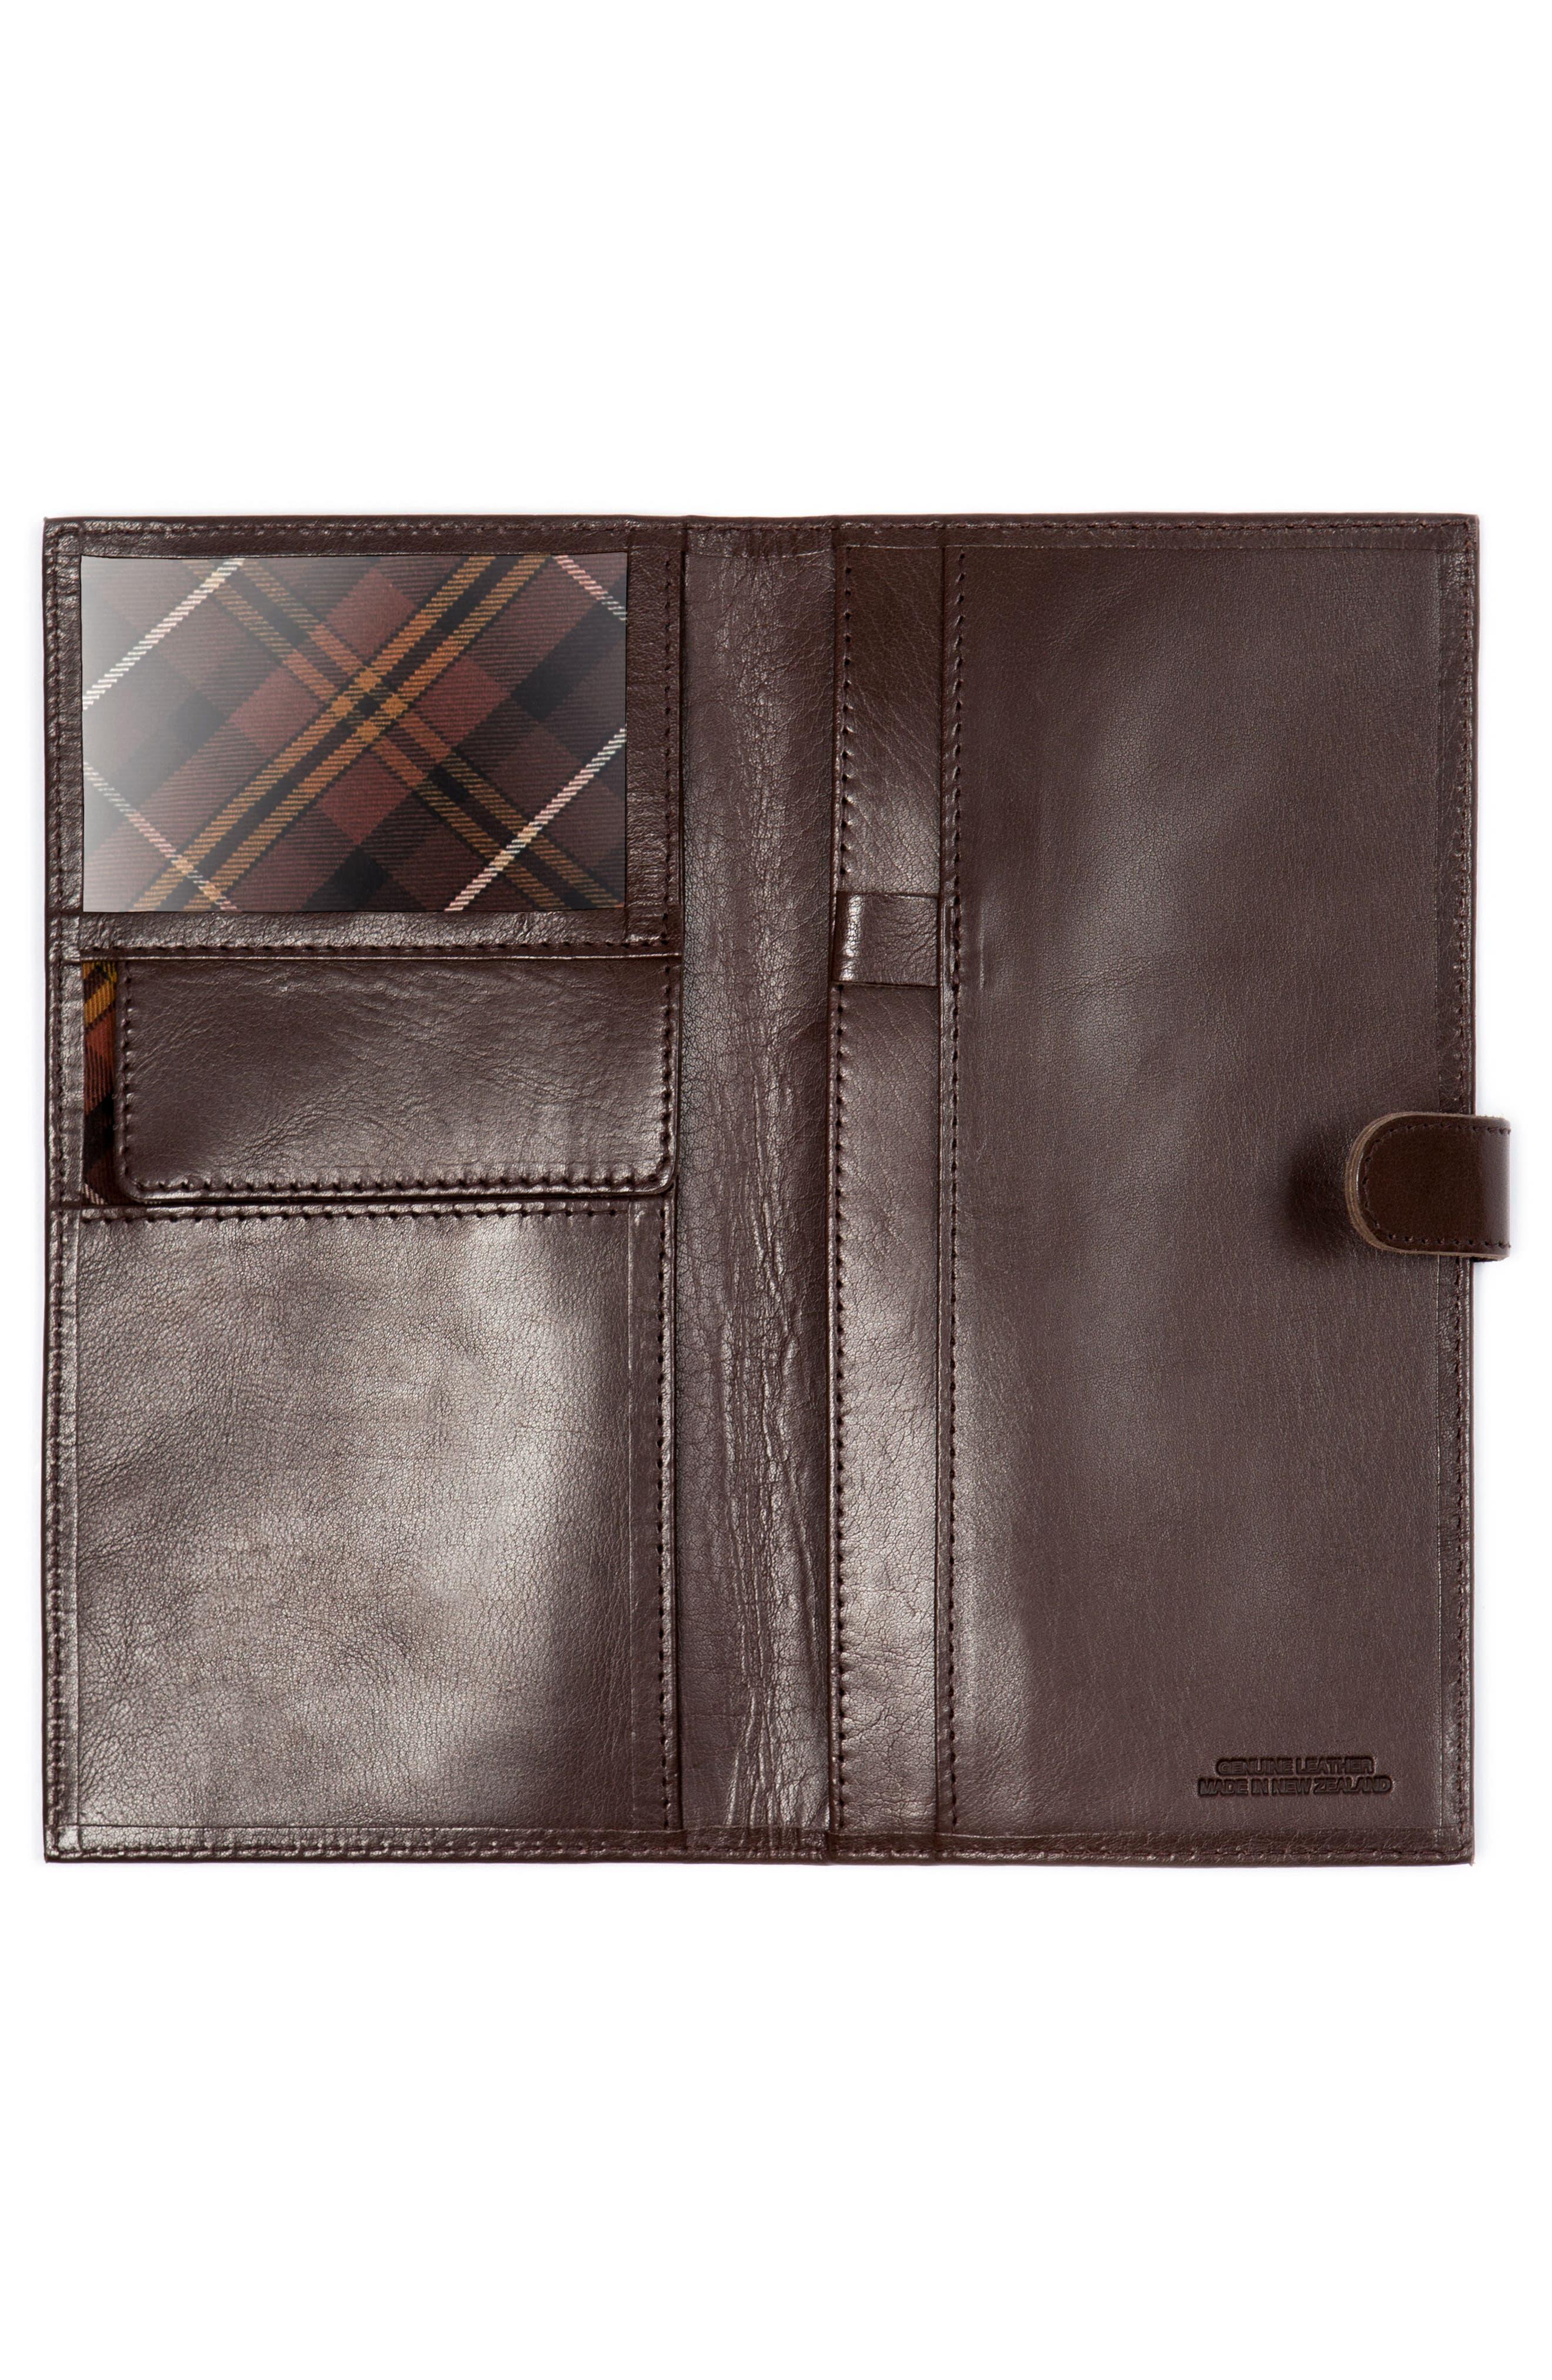 Tom Pearce Travel Wallet,                             Alternate thumbnail 2, color,                             Mud